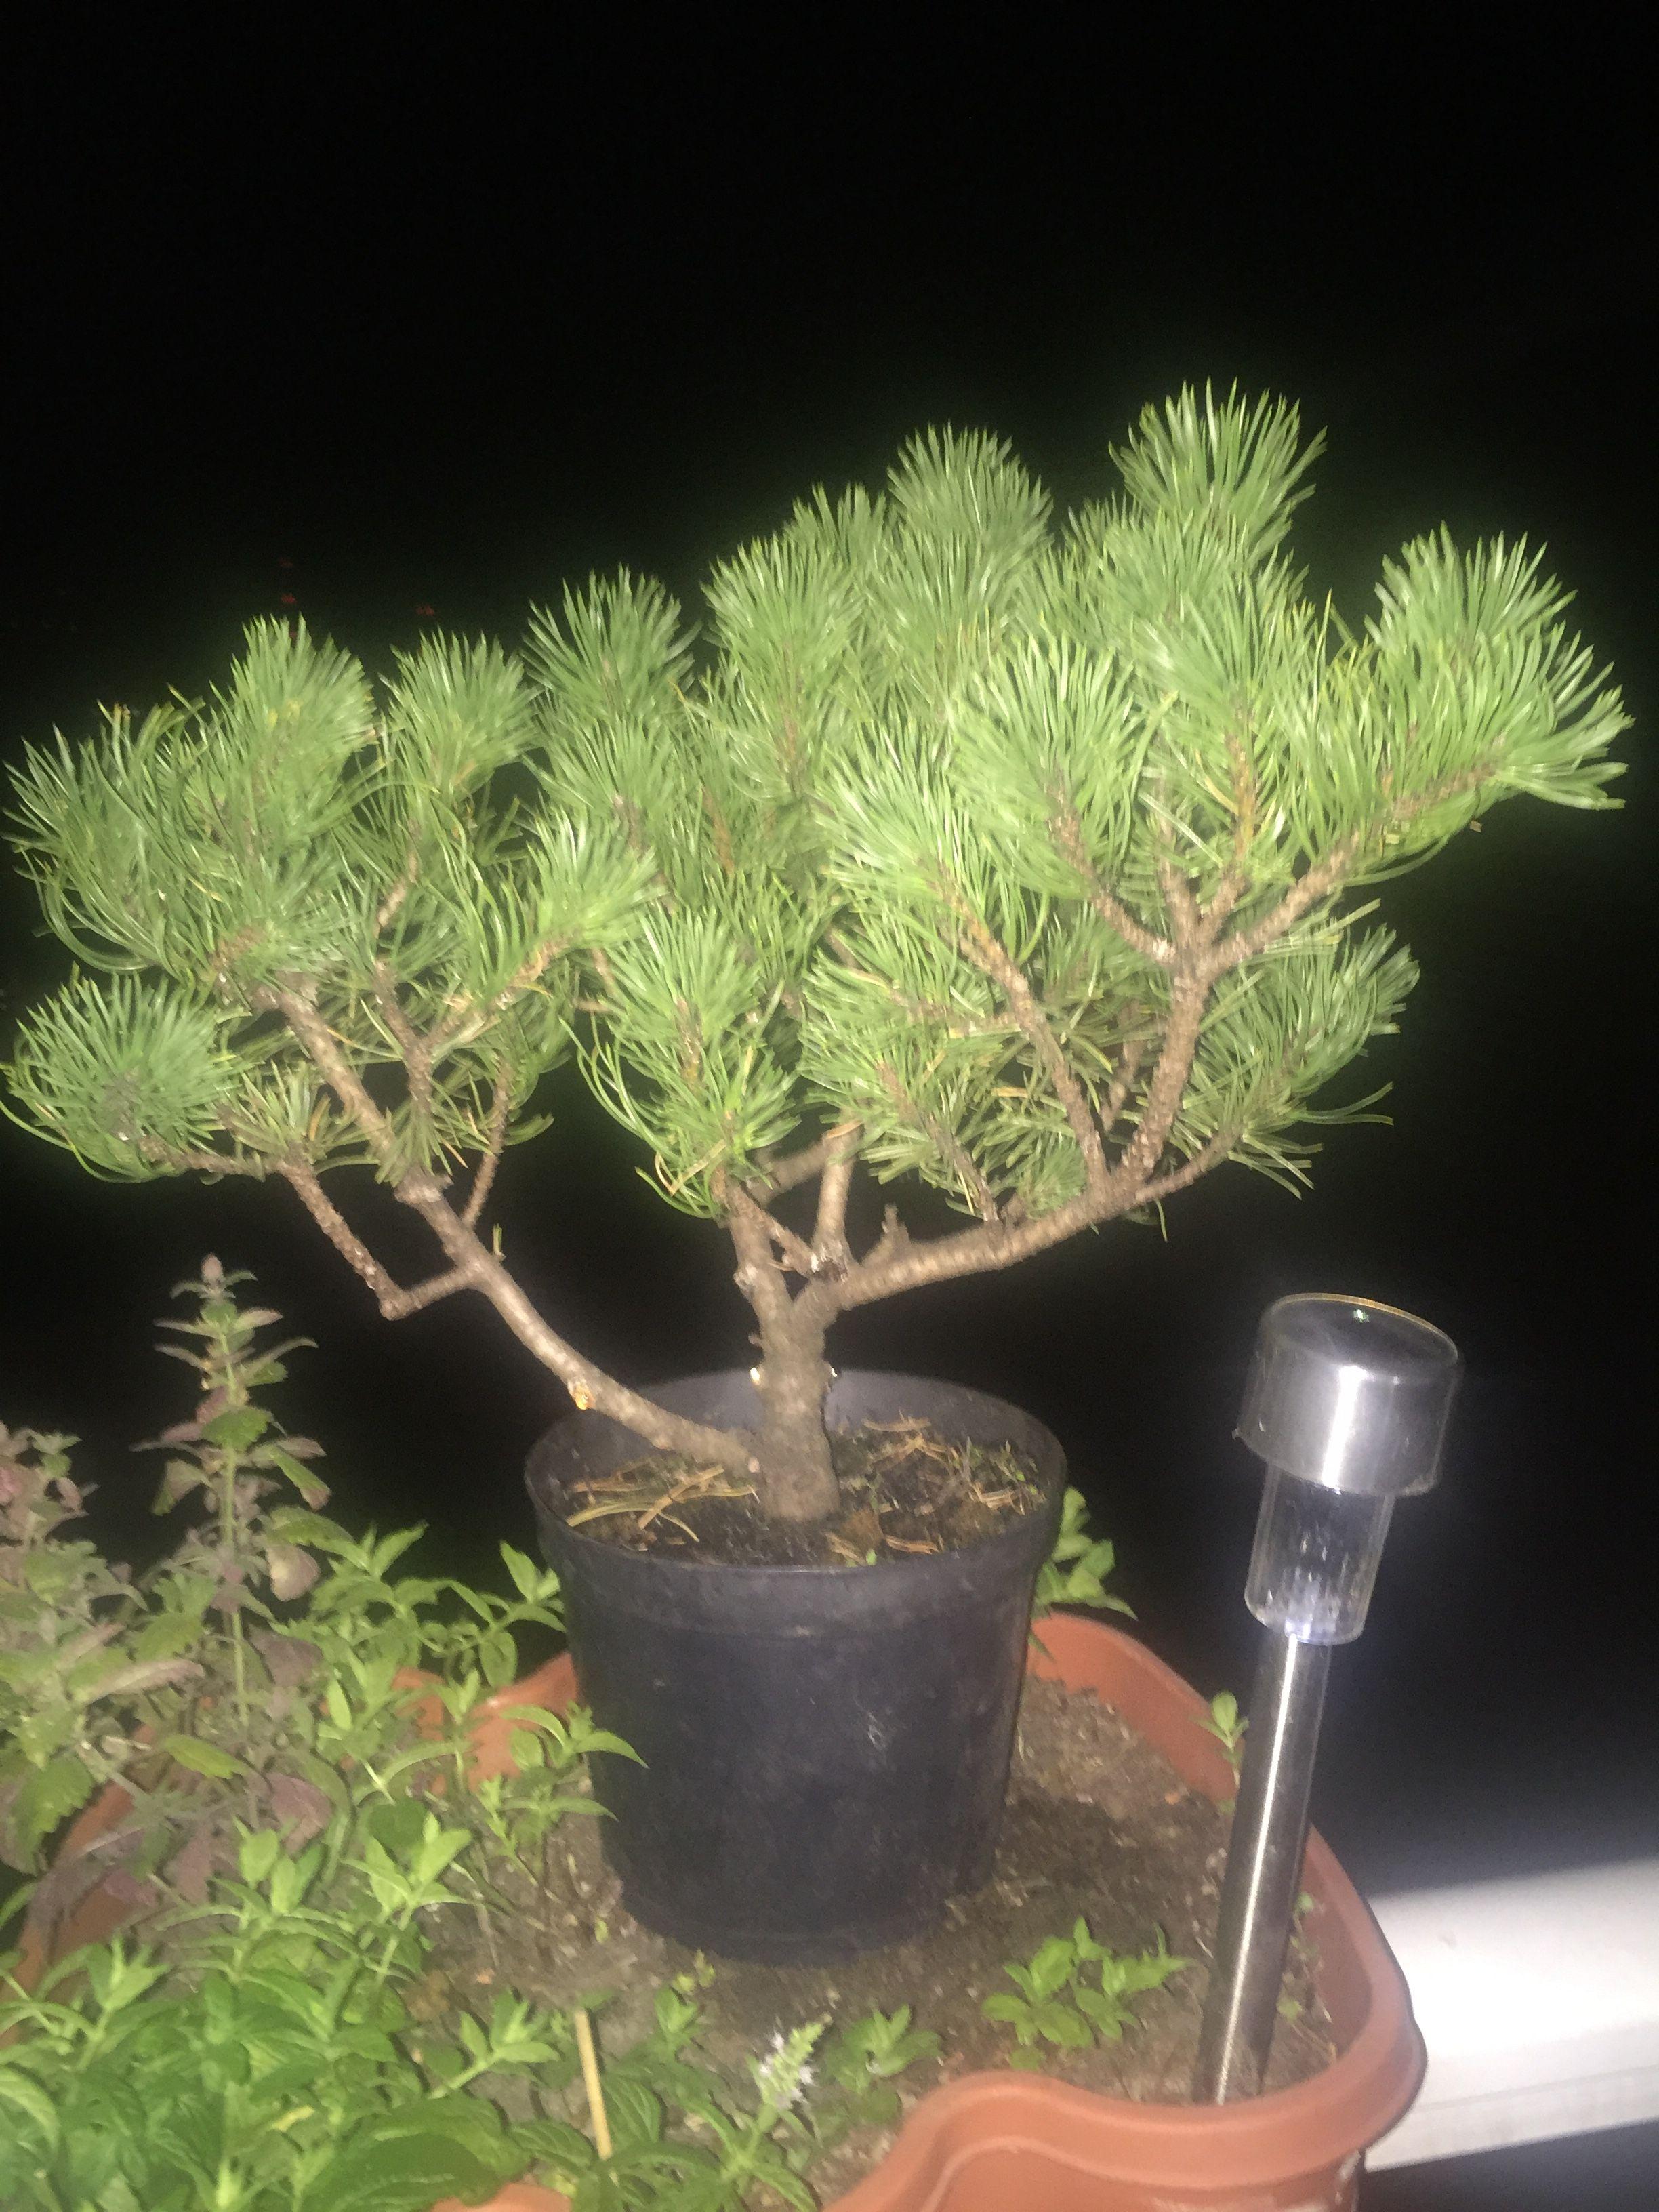 Train for bonsai winter gold pine